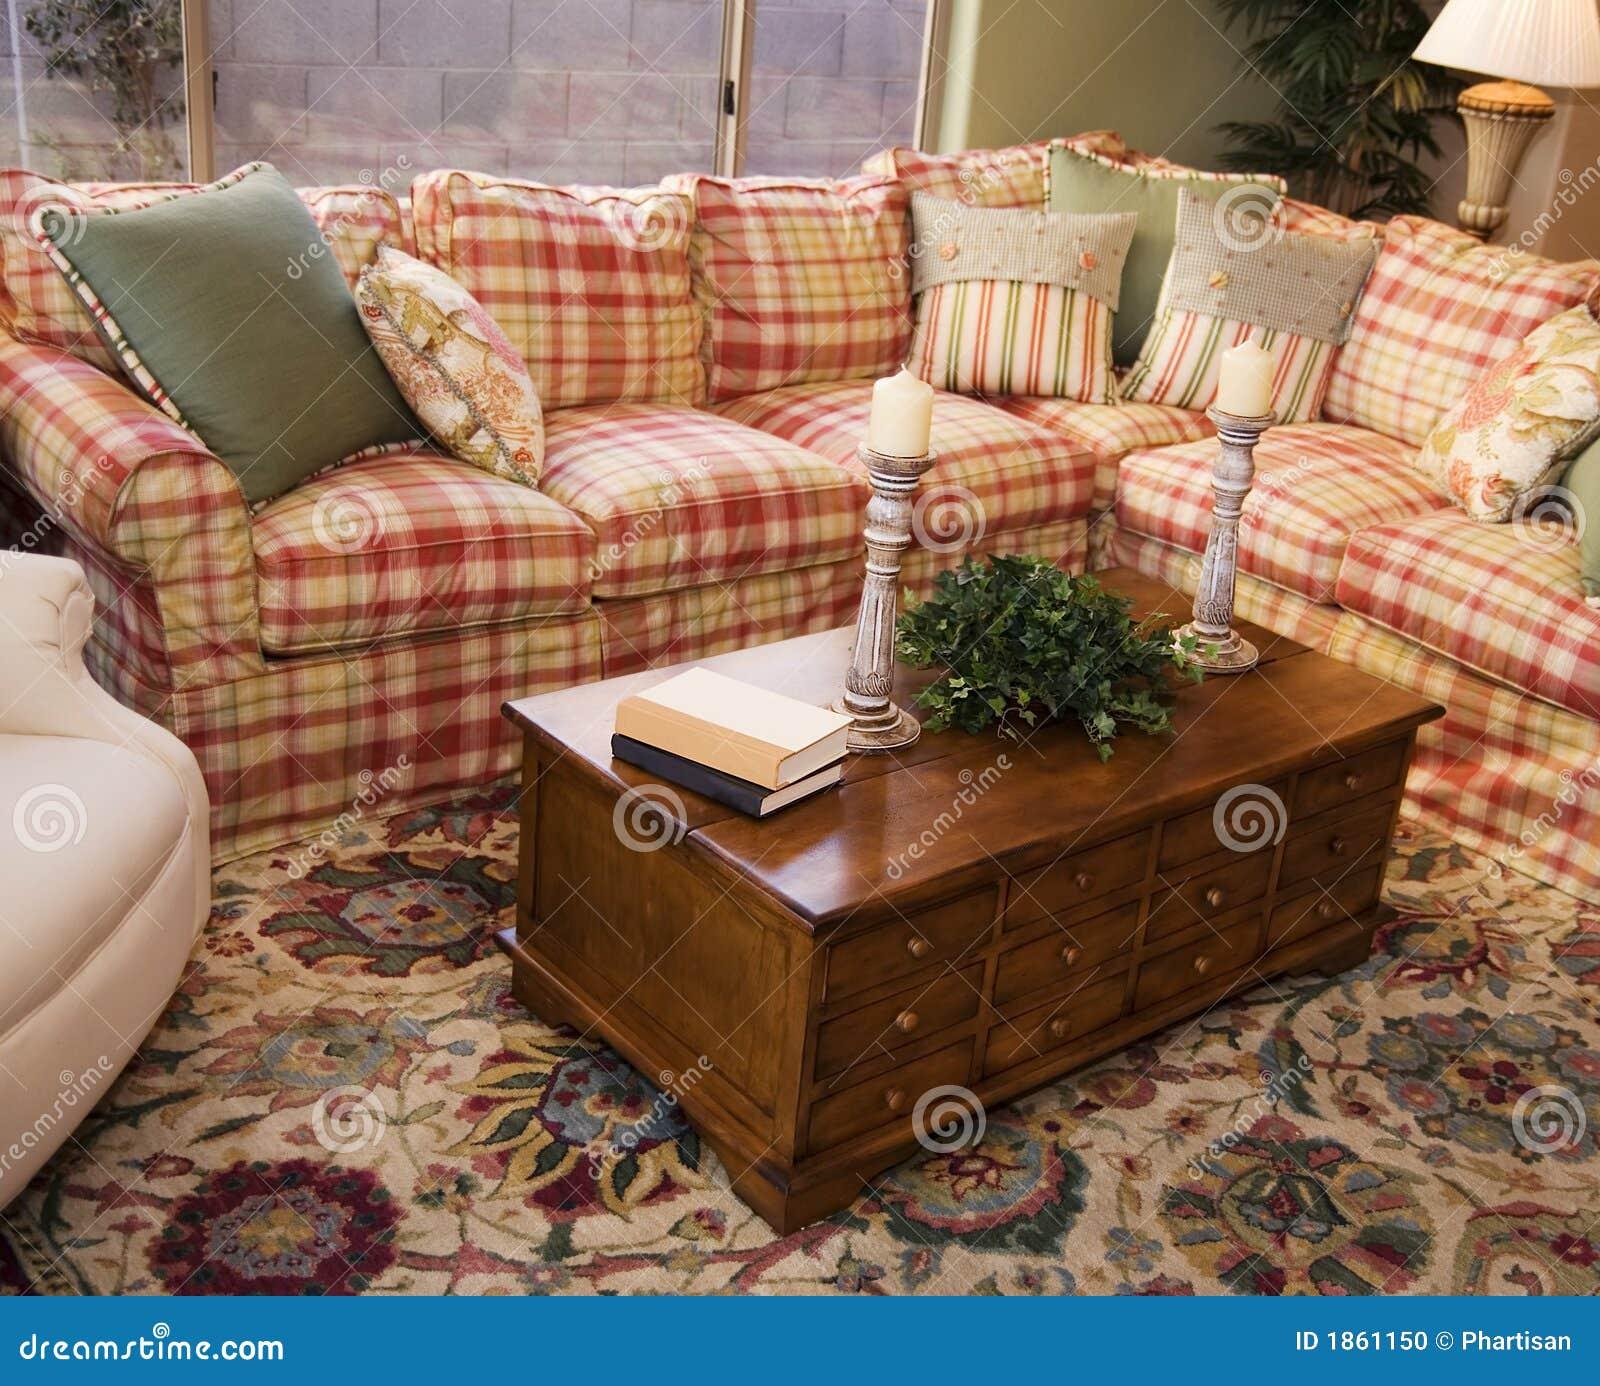 New model interior design stock photo image of cushions for New model interior design